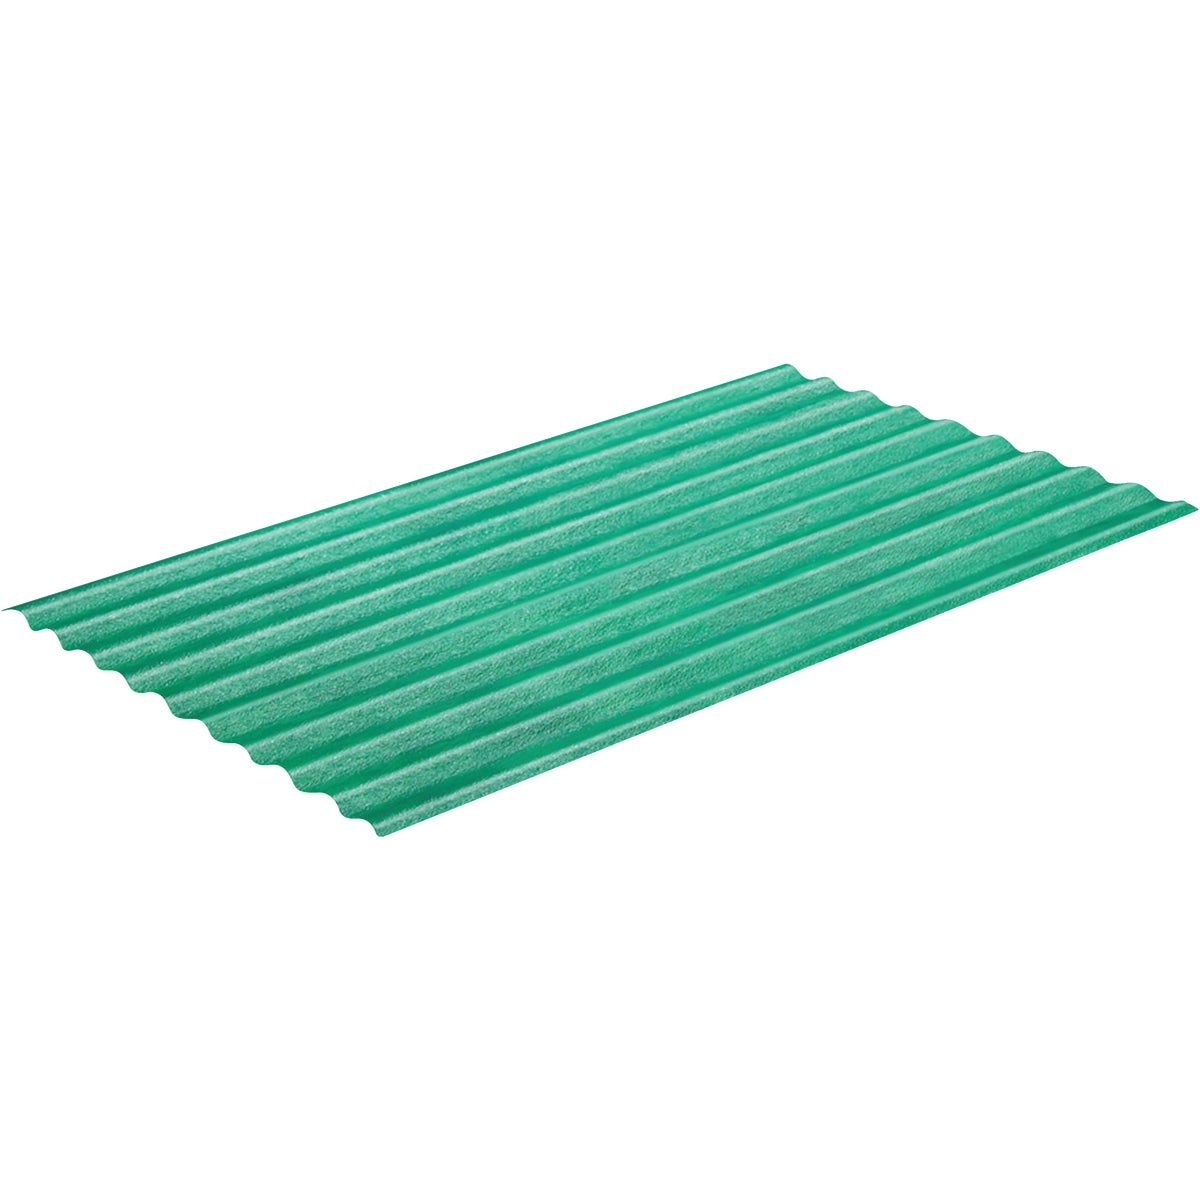 Fiberglass Corrugated Panels